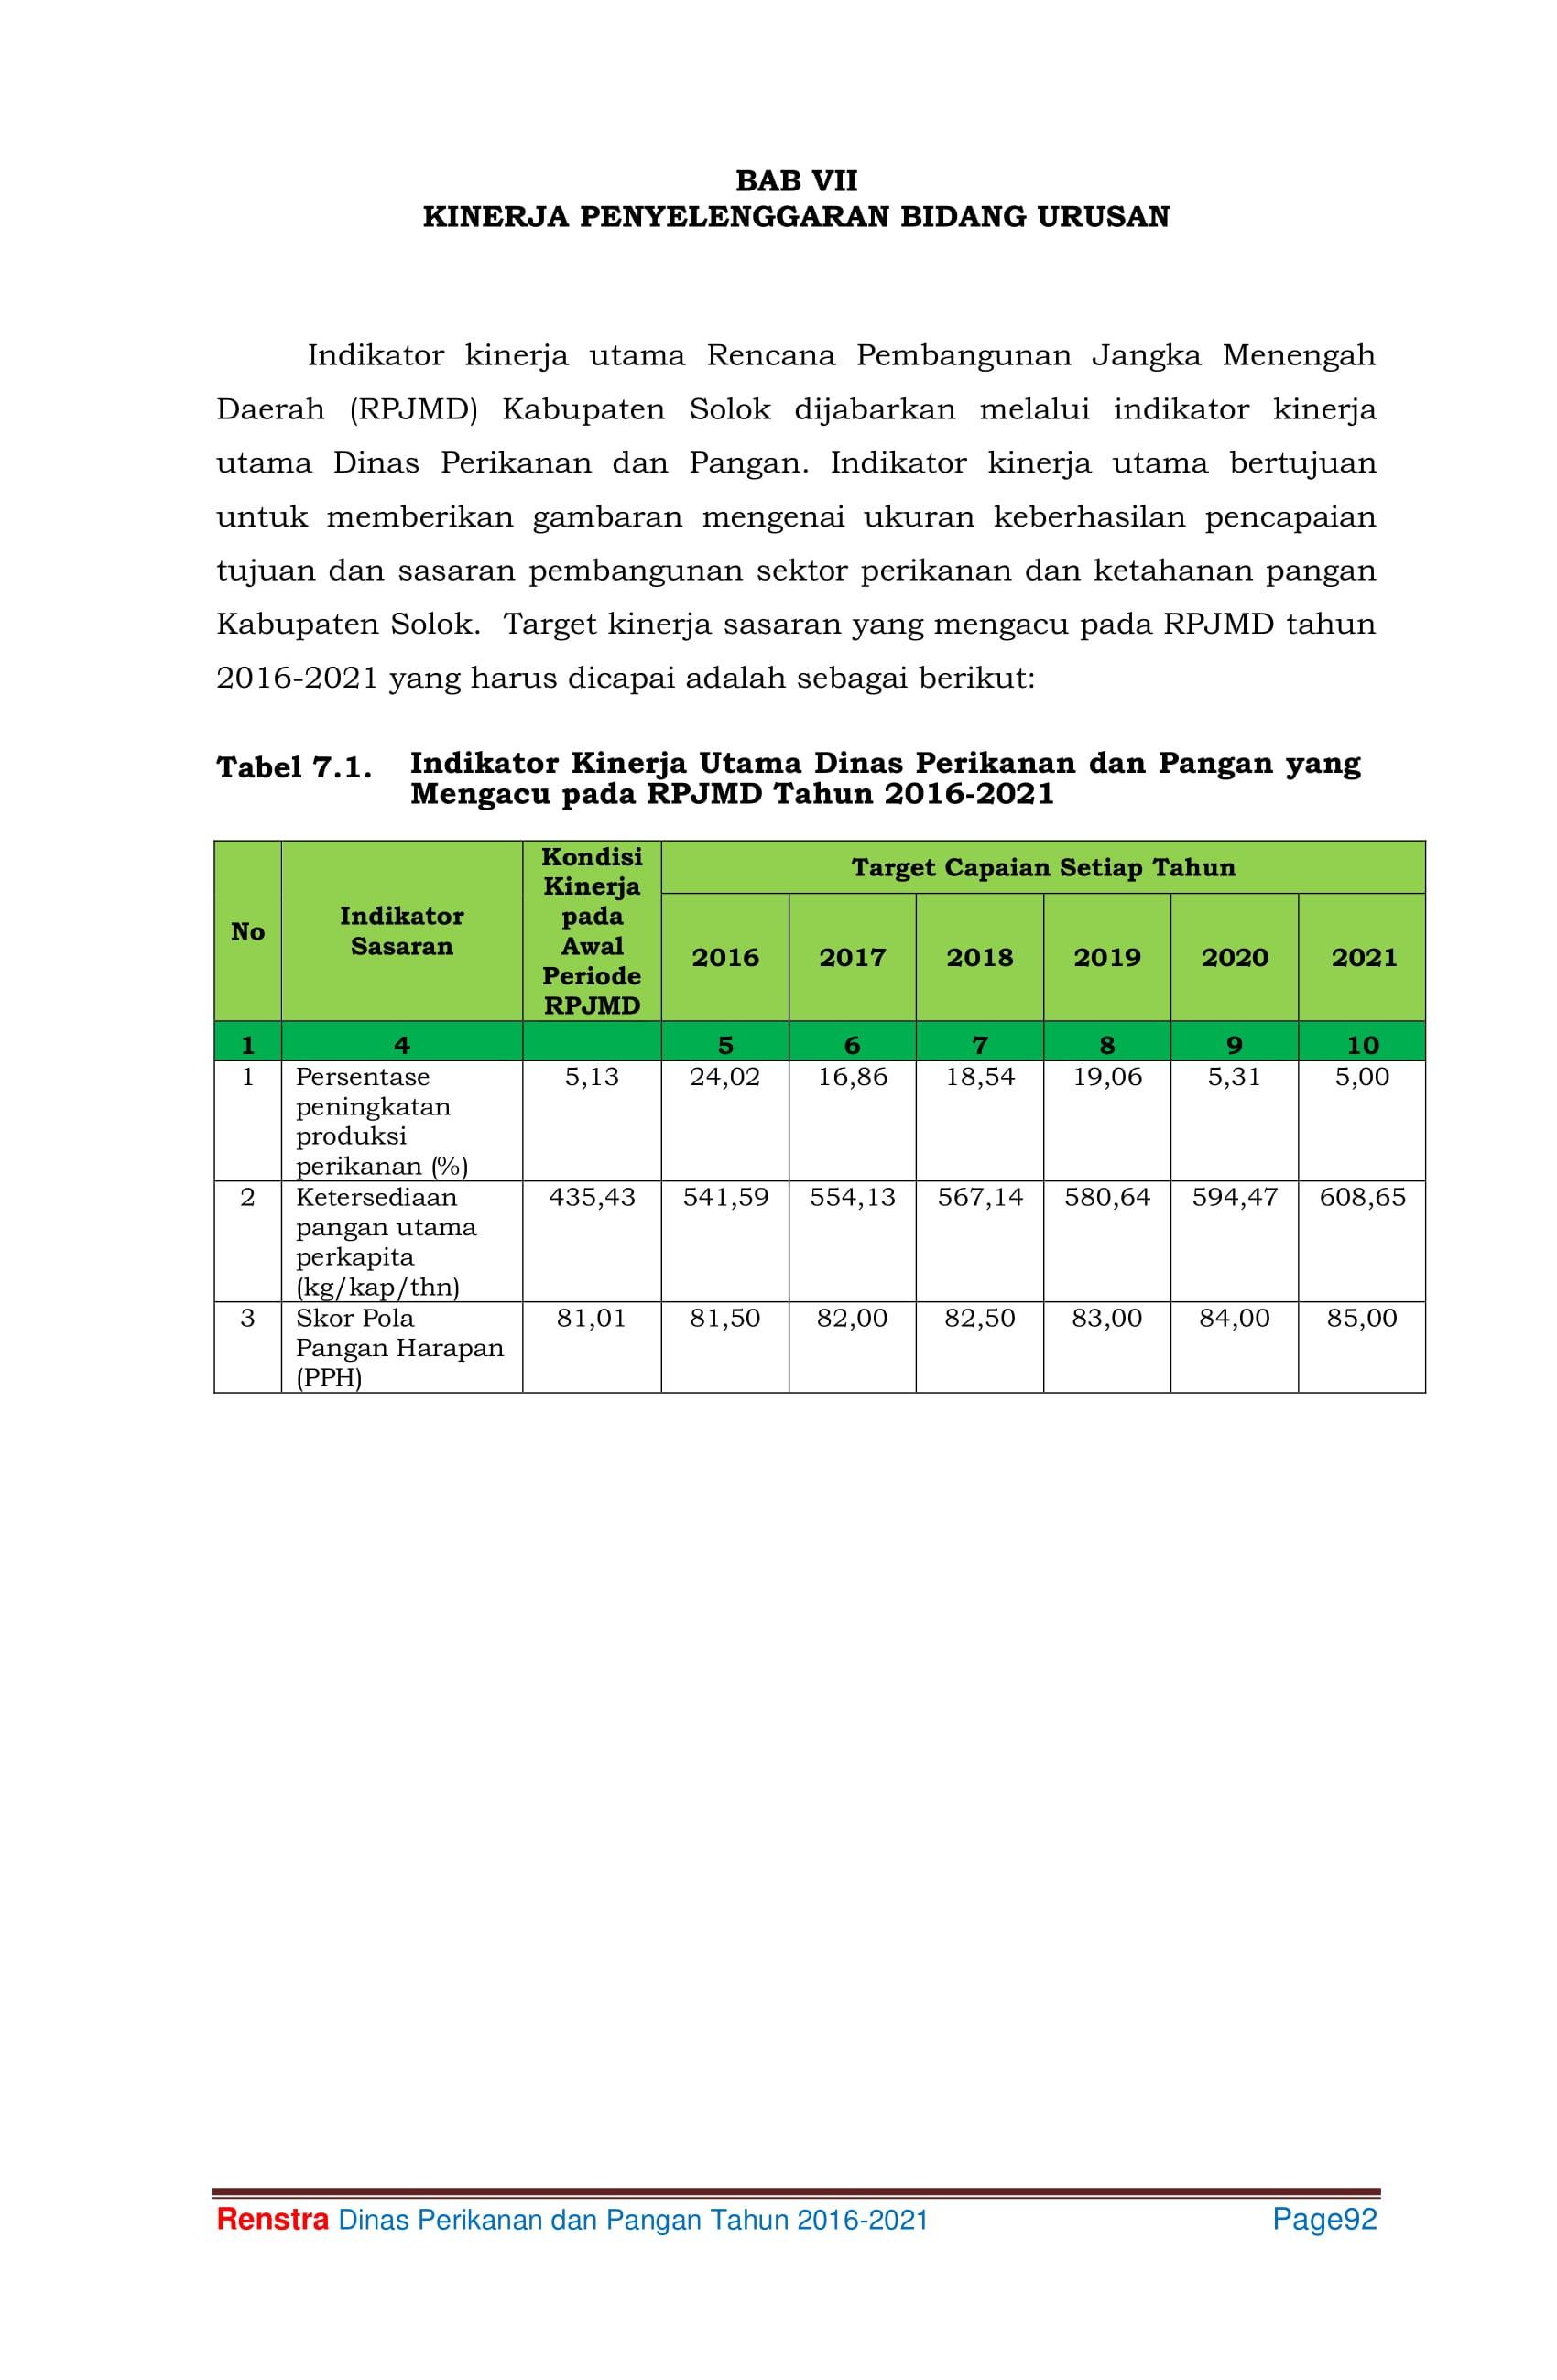 Renstra DPP 2016-2021 109